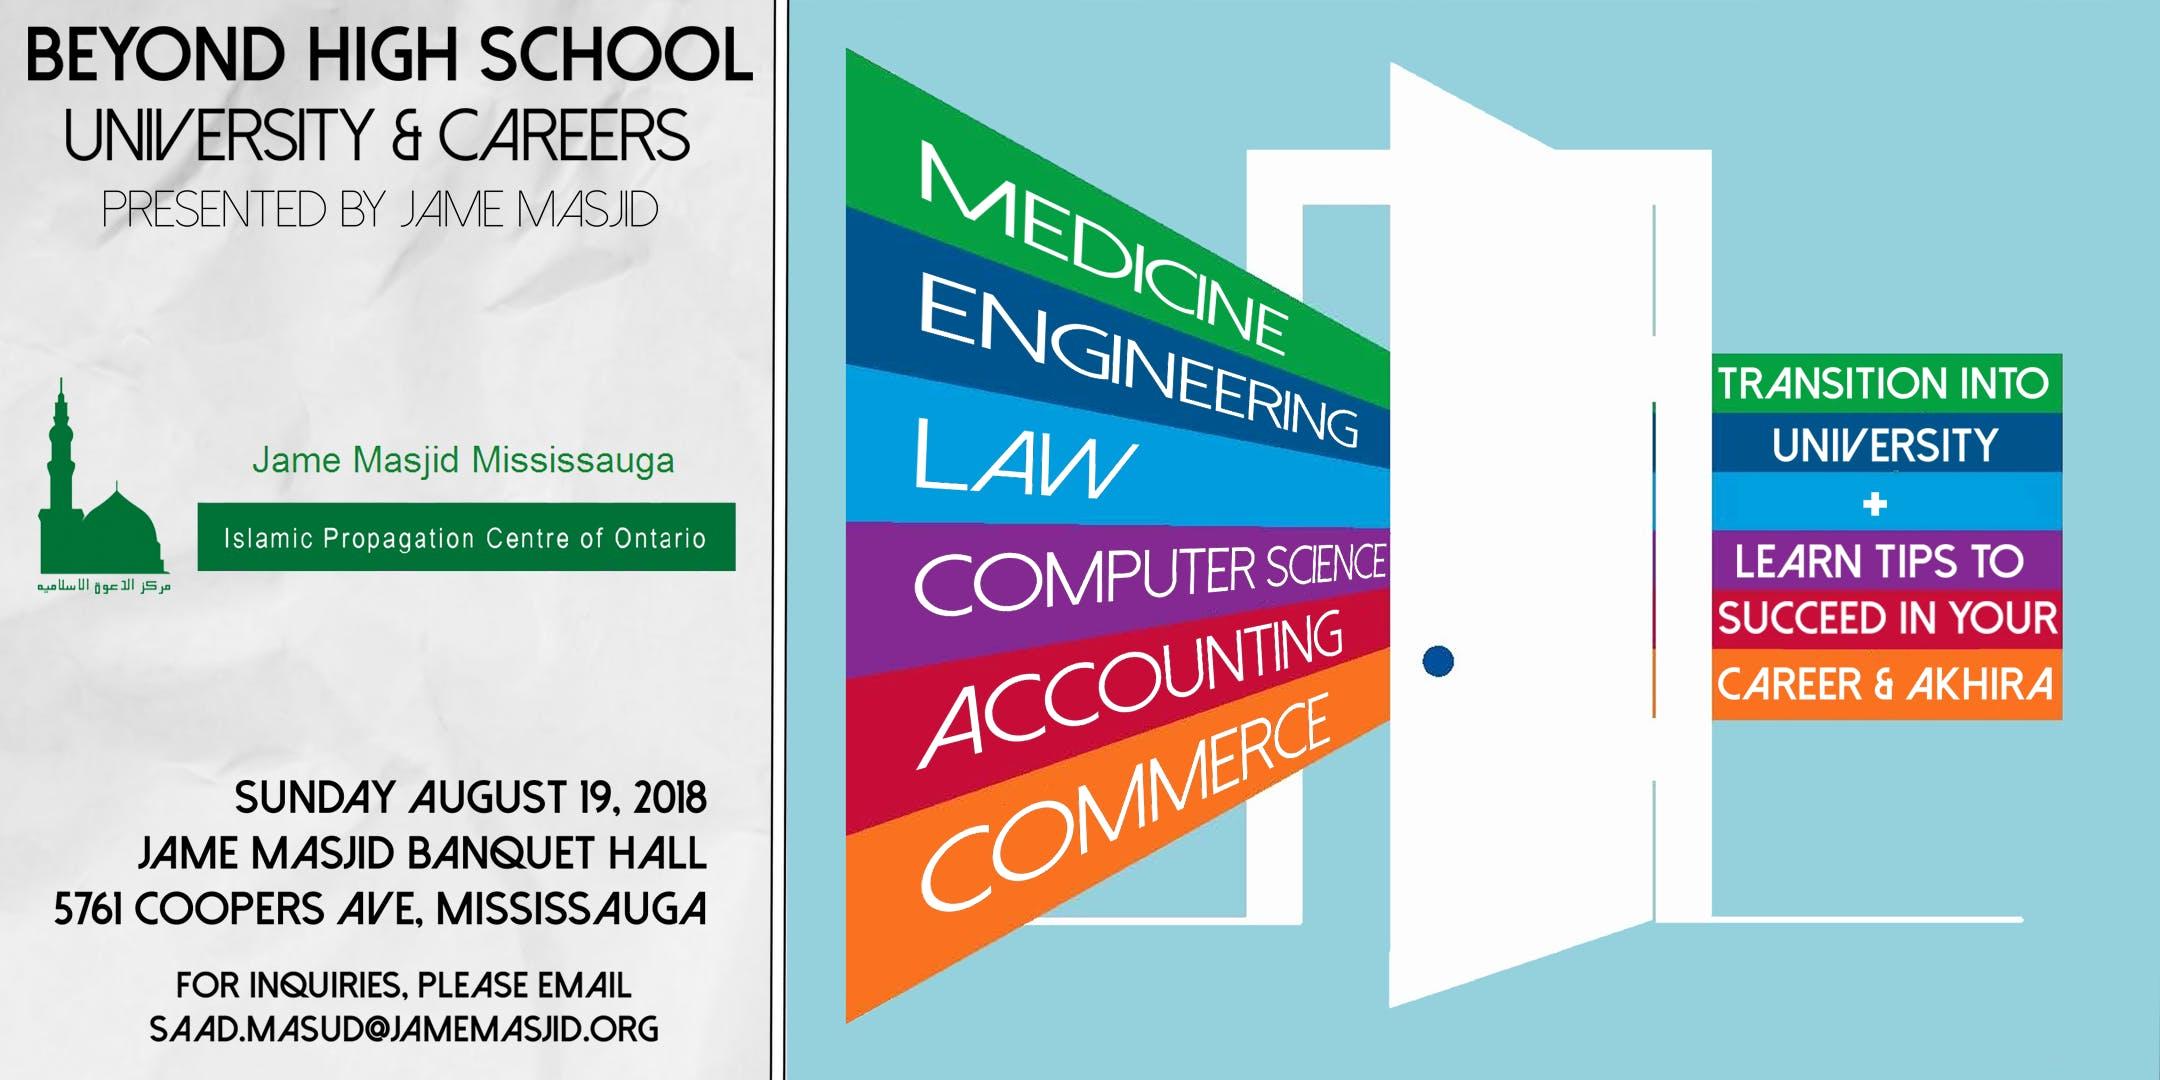 Beyond High School: University & Career Fair